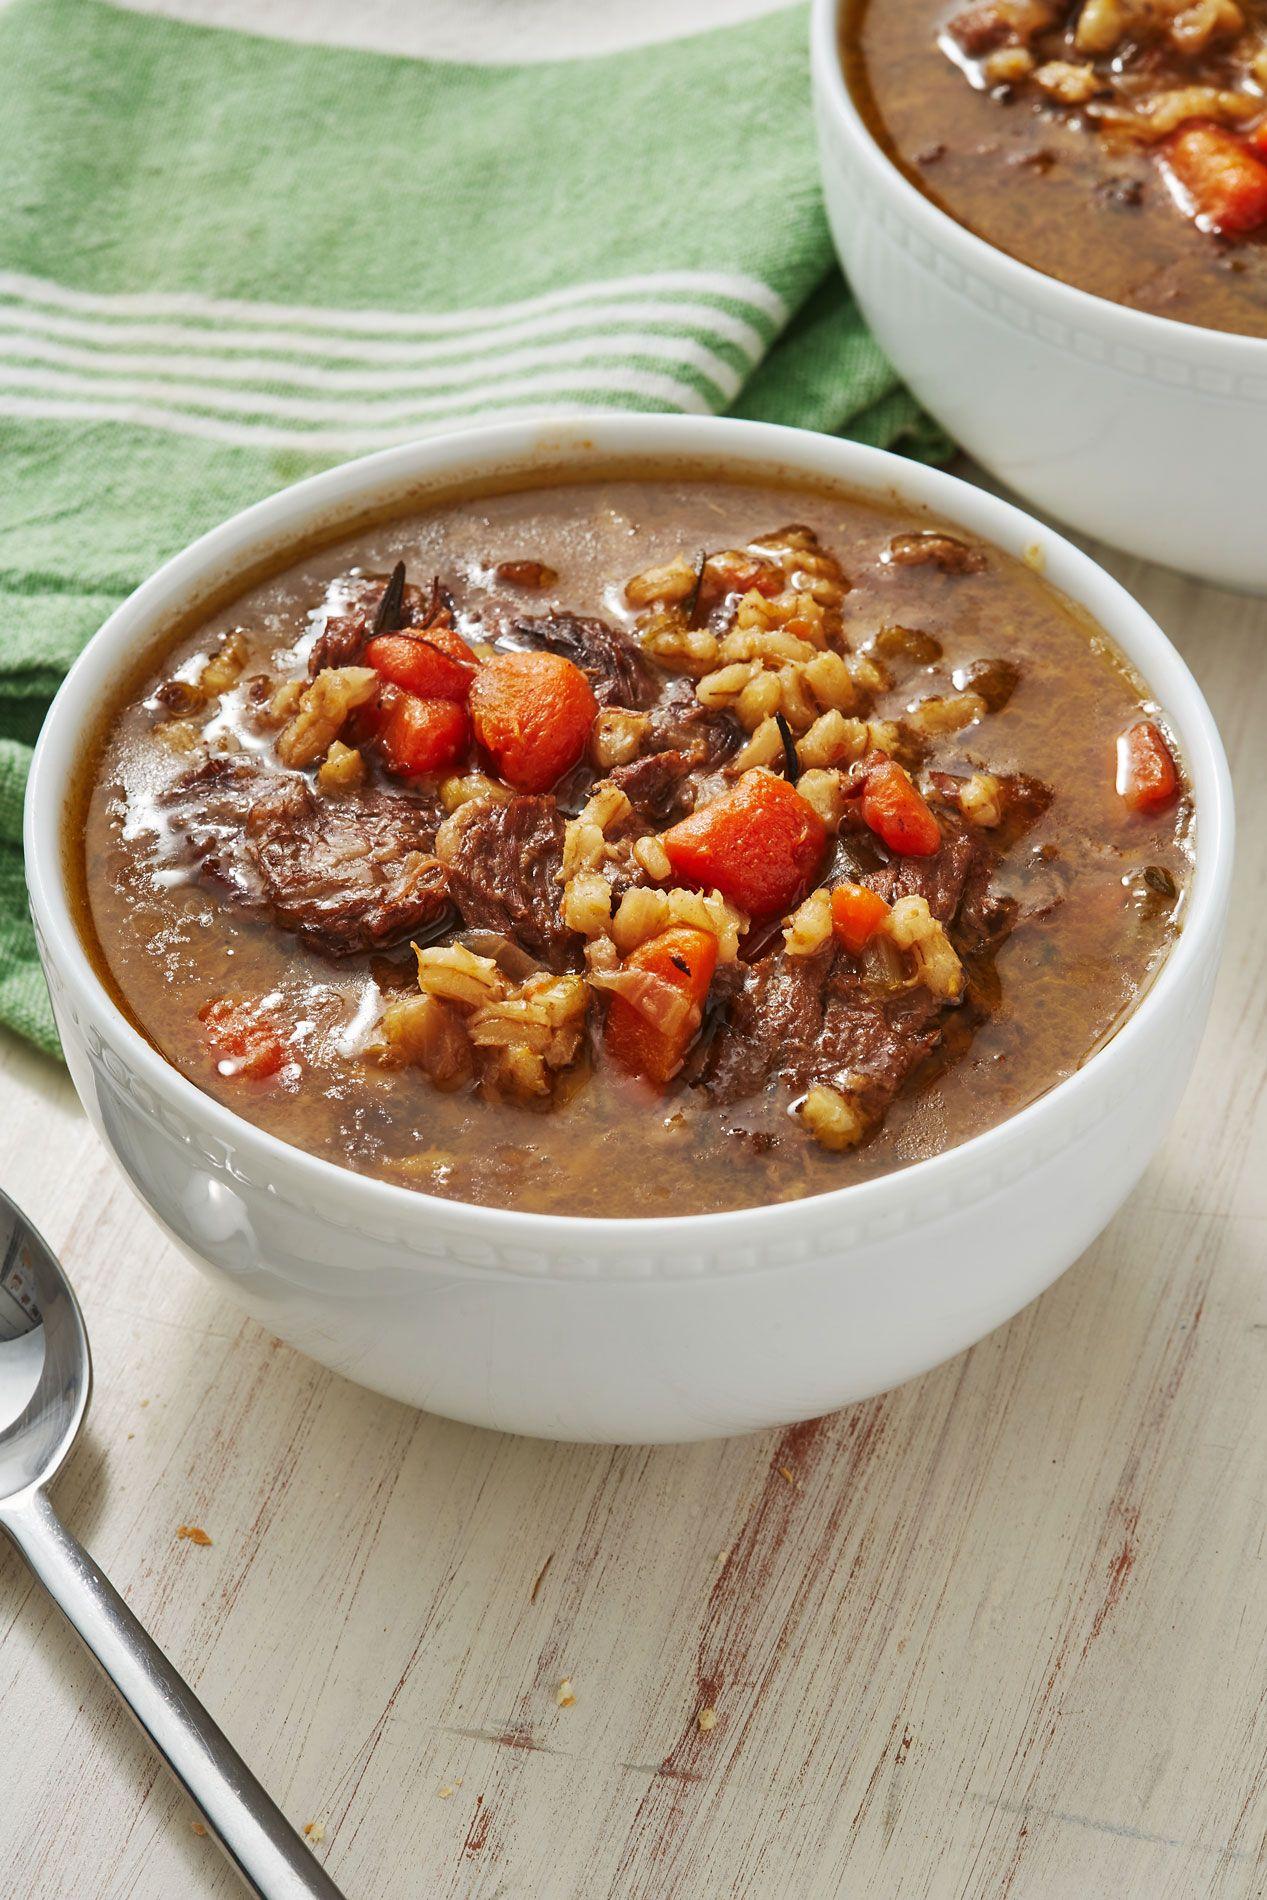 Best Prime Rib Soup Recipe How To Make Prime Rib Soup